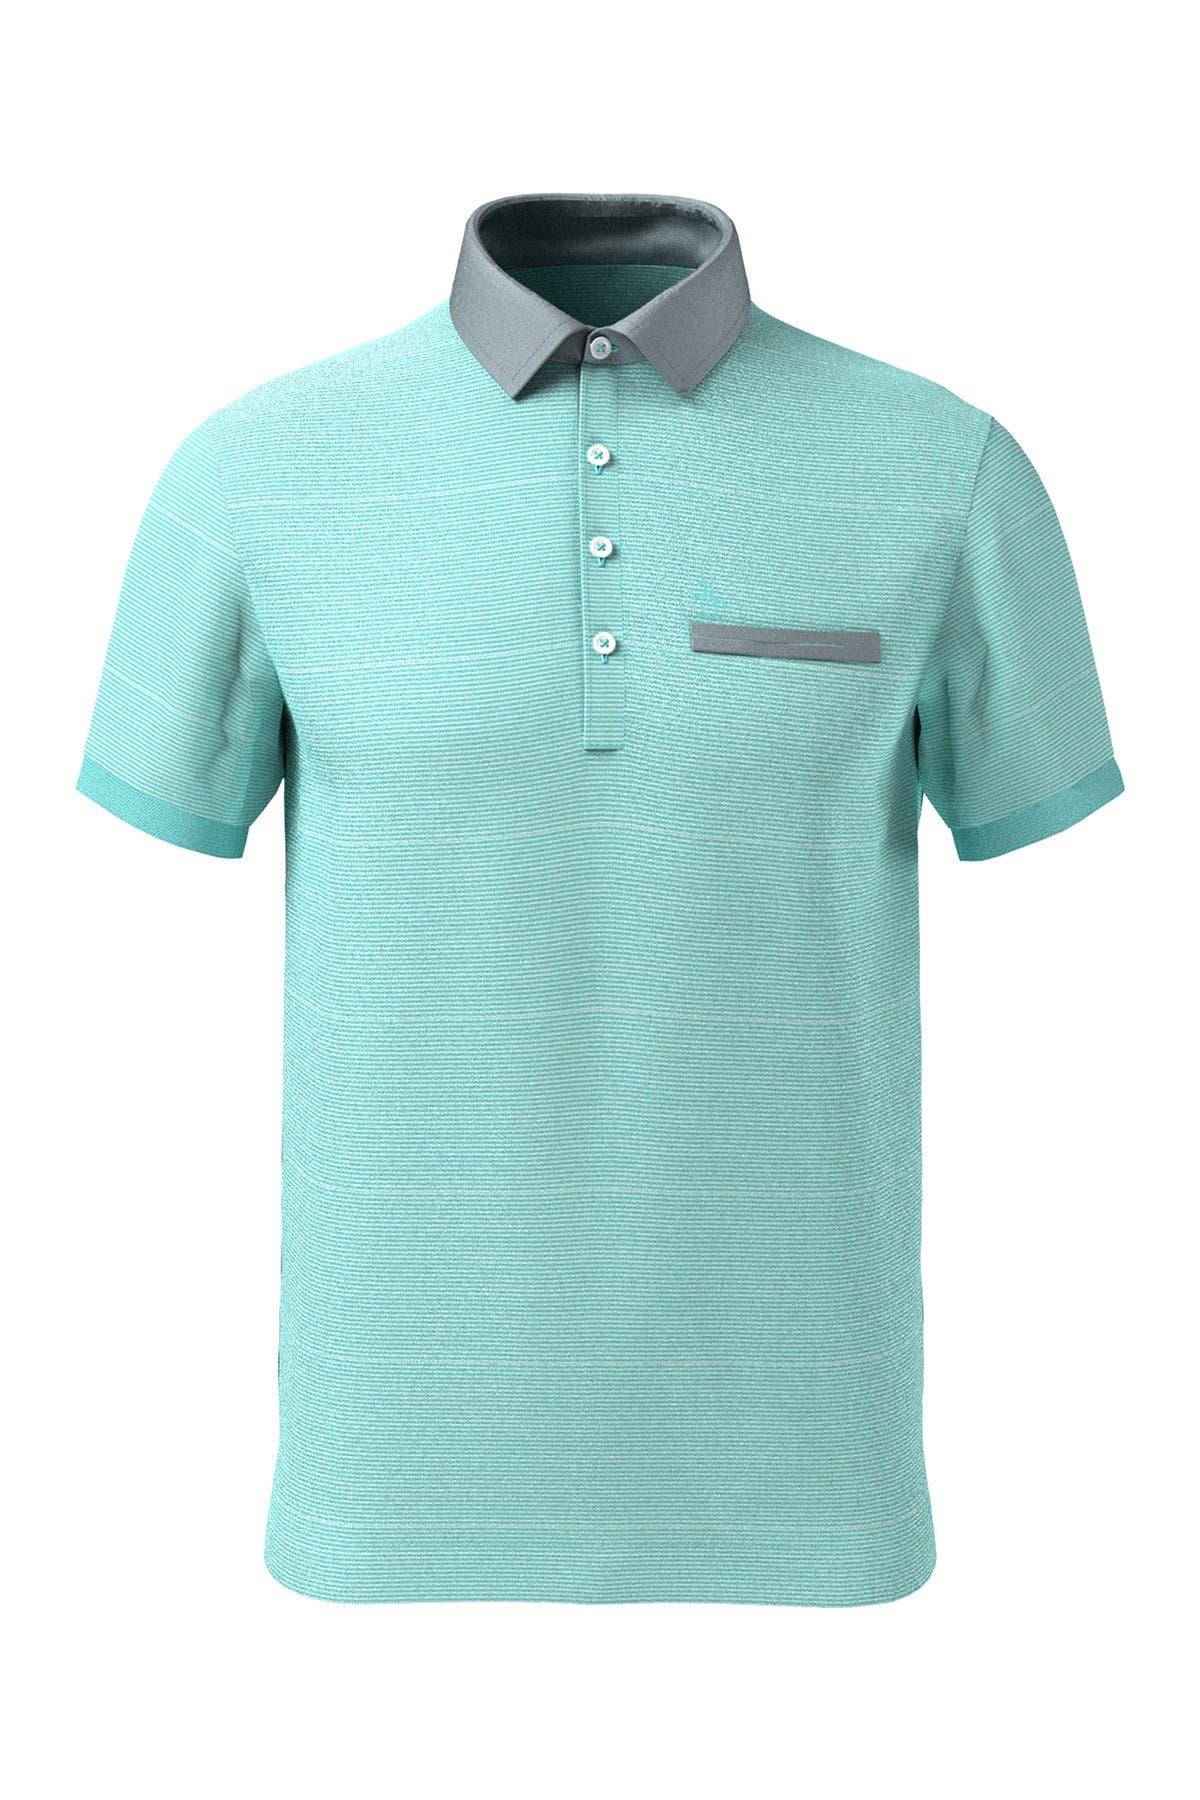 Image of Original Penguin Feeder Stripe Short Sleeve Polo Shirt